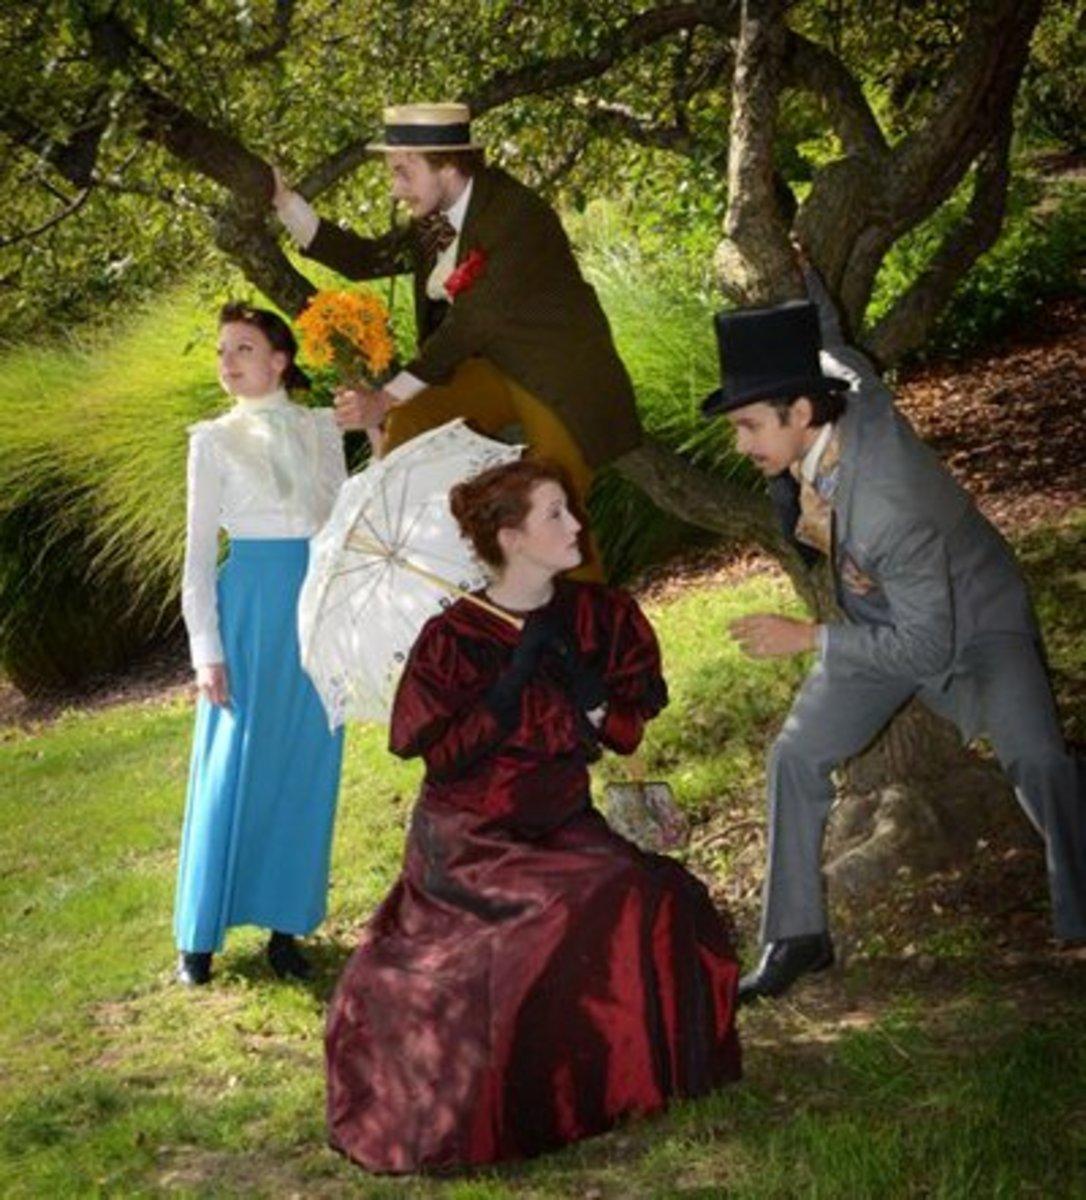 Essay: A Tragic Comedy - The Cherry Orchard by Anton Chekhov